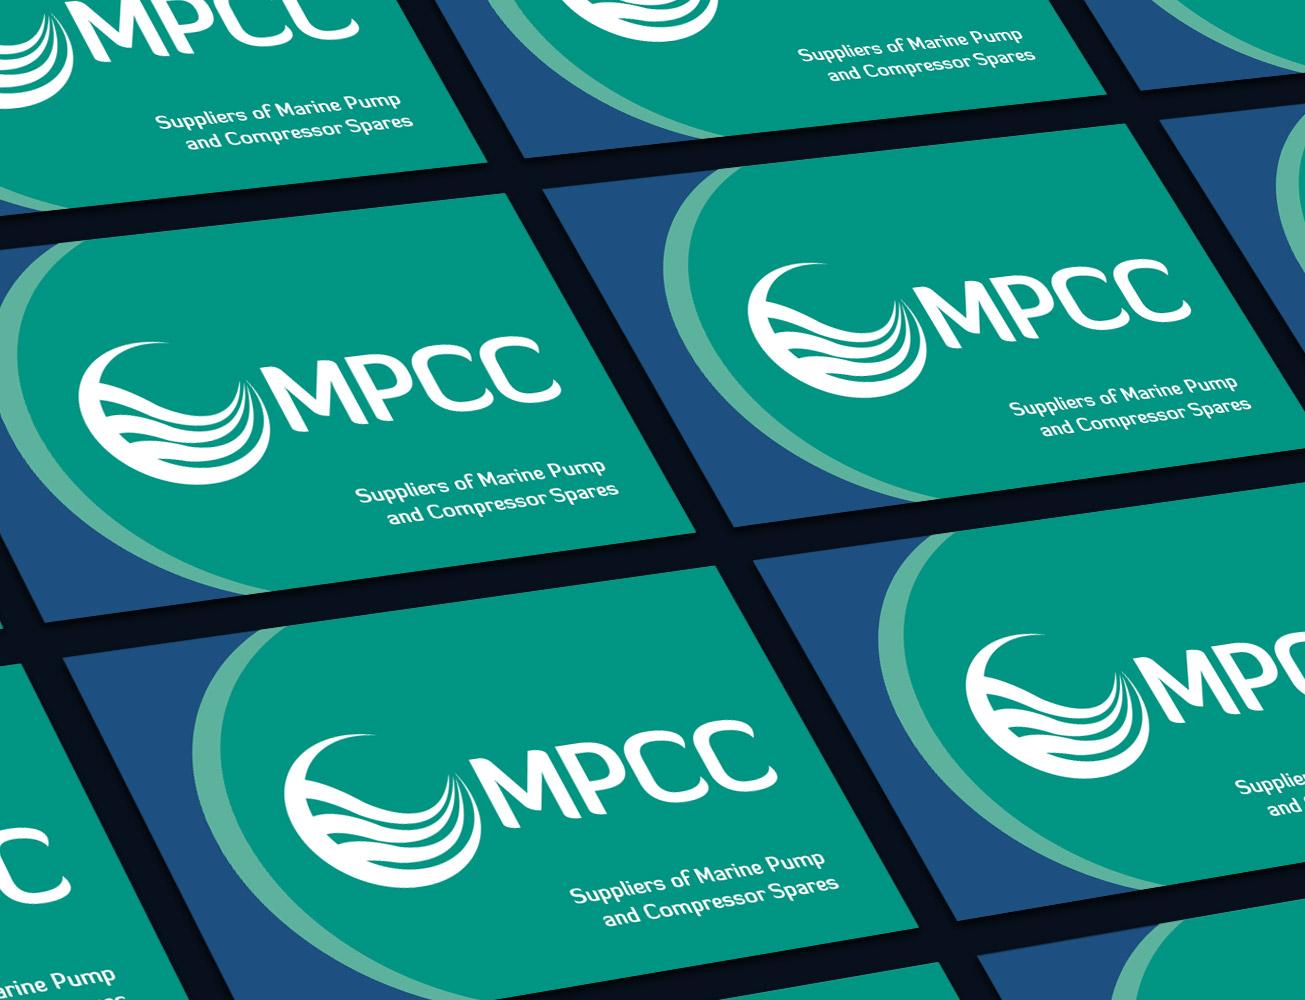 mpcc-cards-2